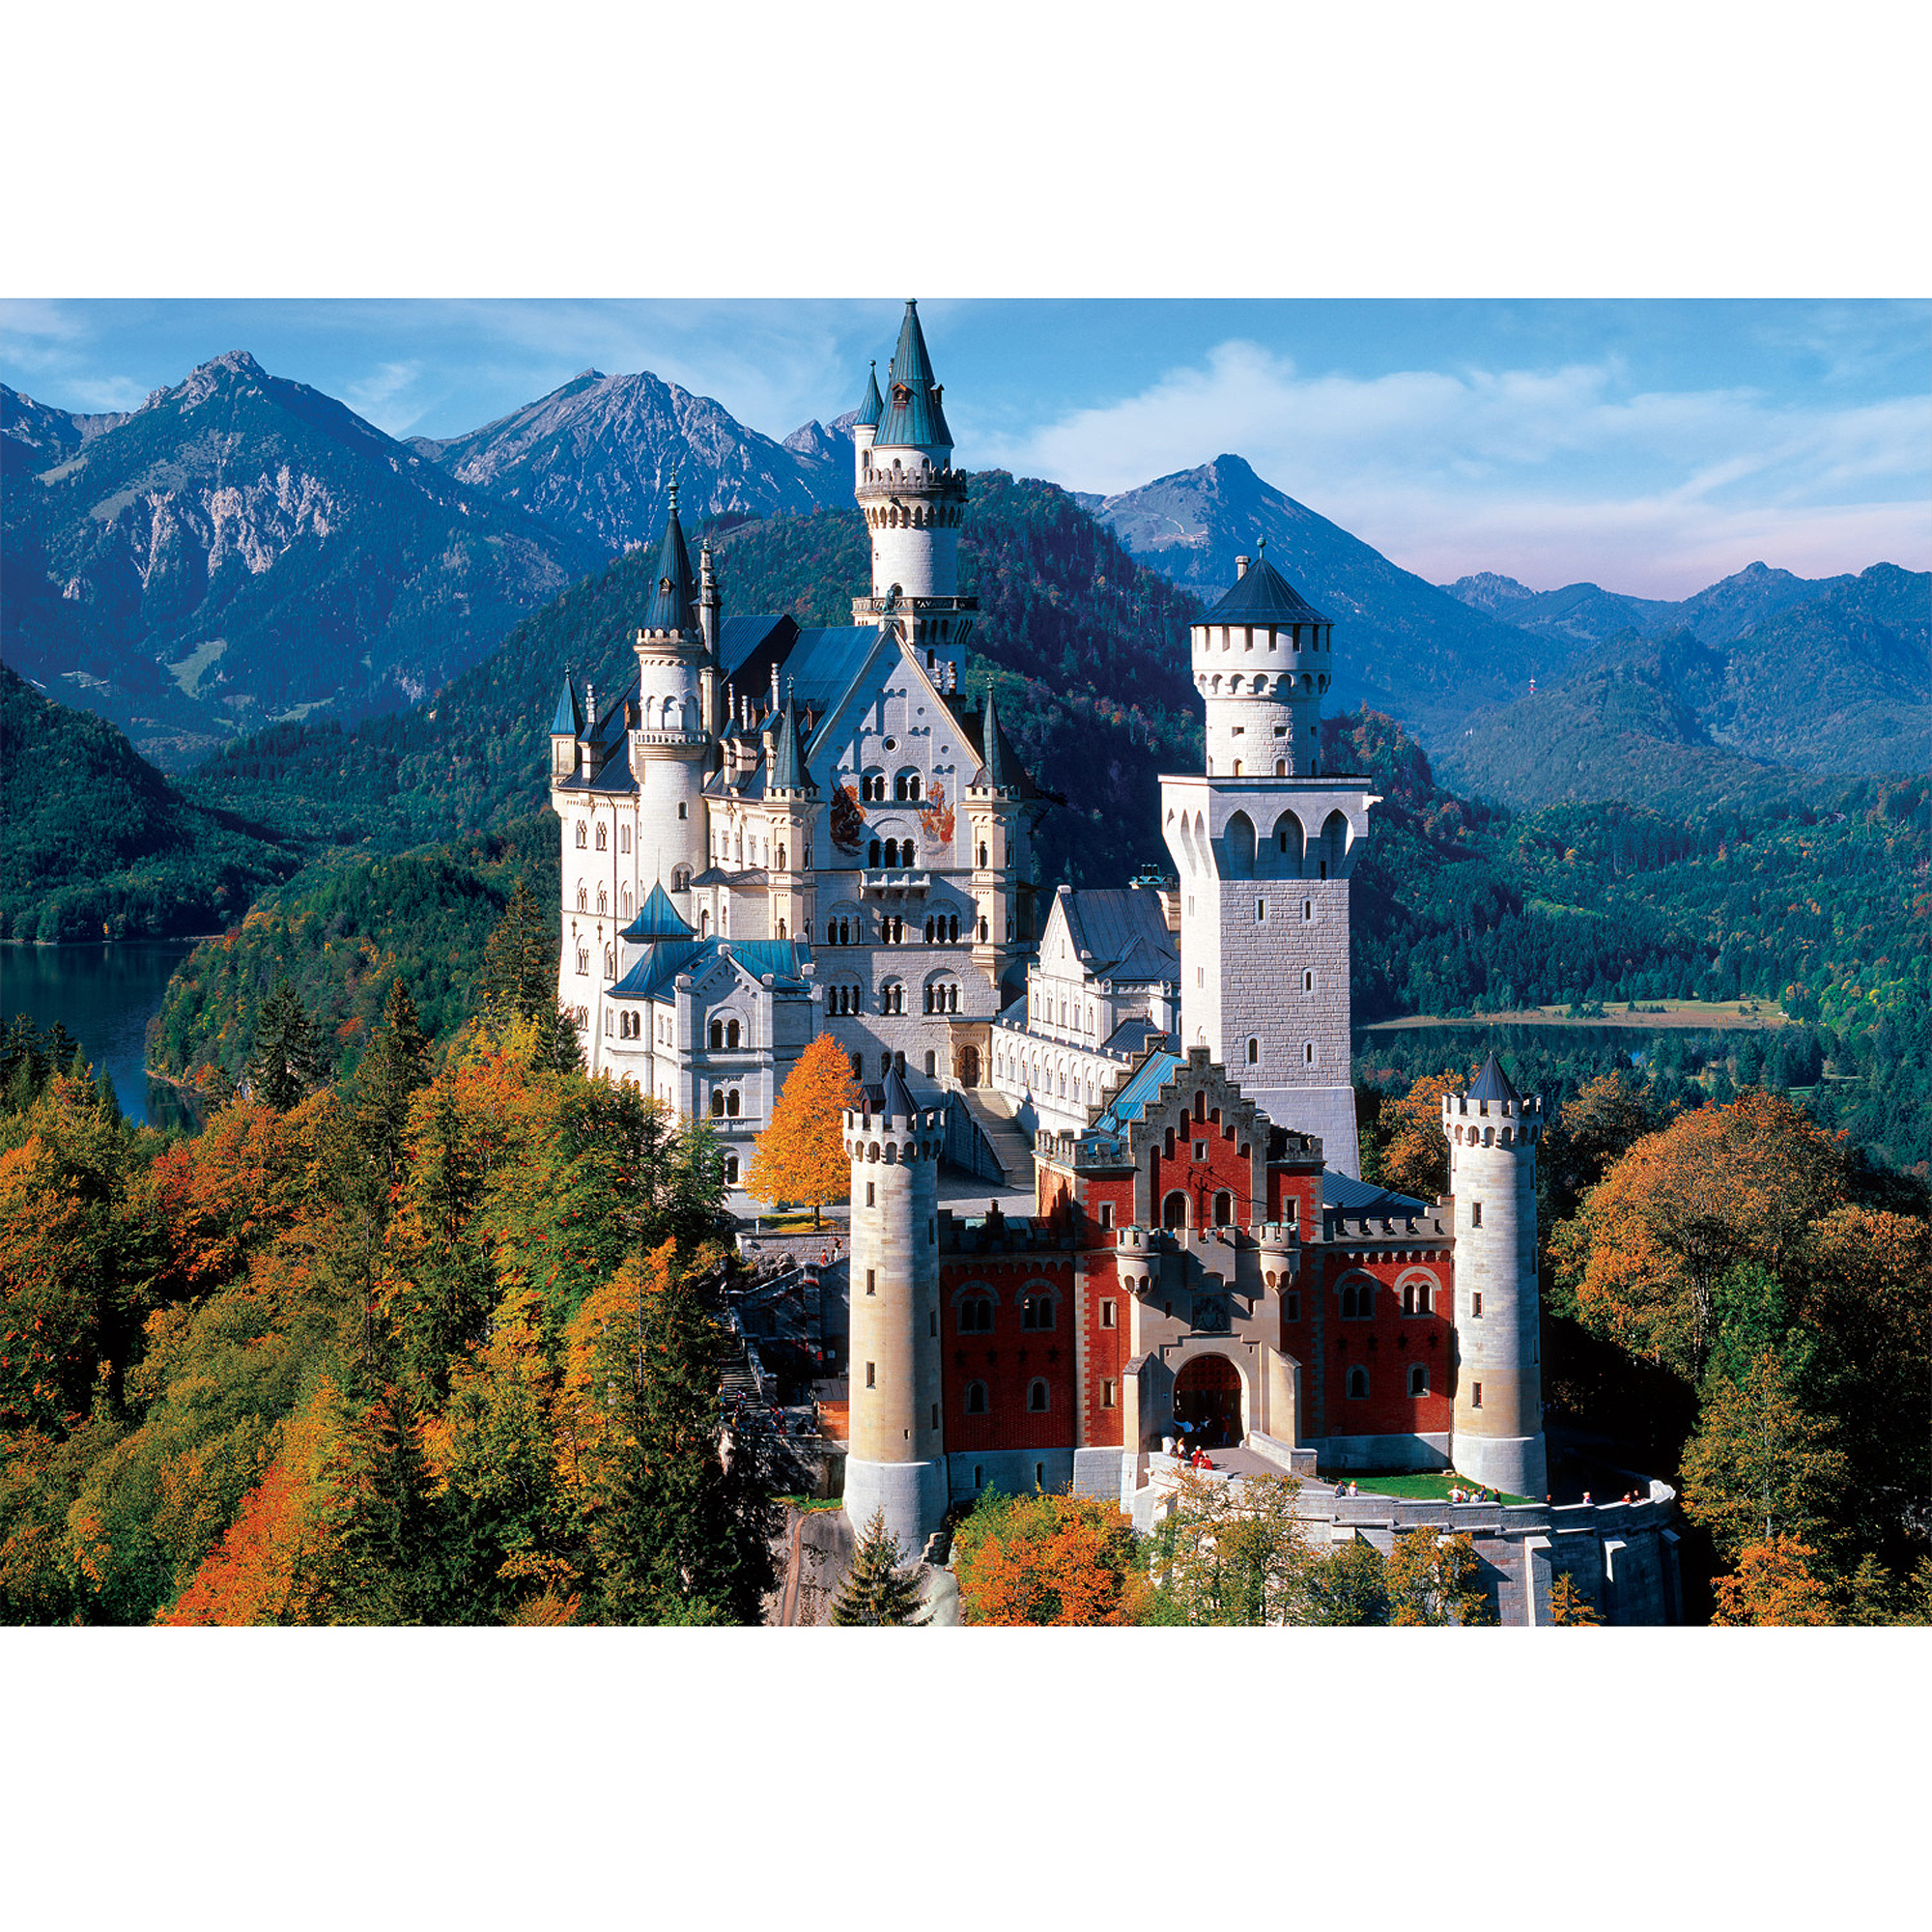 Buffalo Games Large Pieces Neuschwanstein Castle Jigsaw Puzzle, 1,000 Pieces